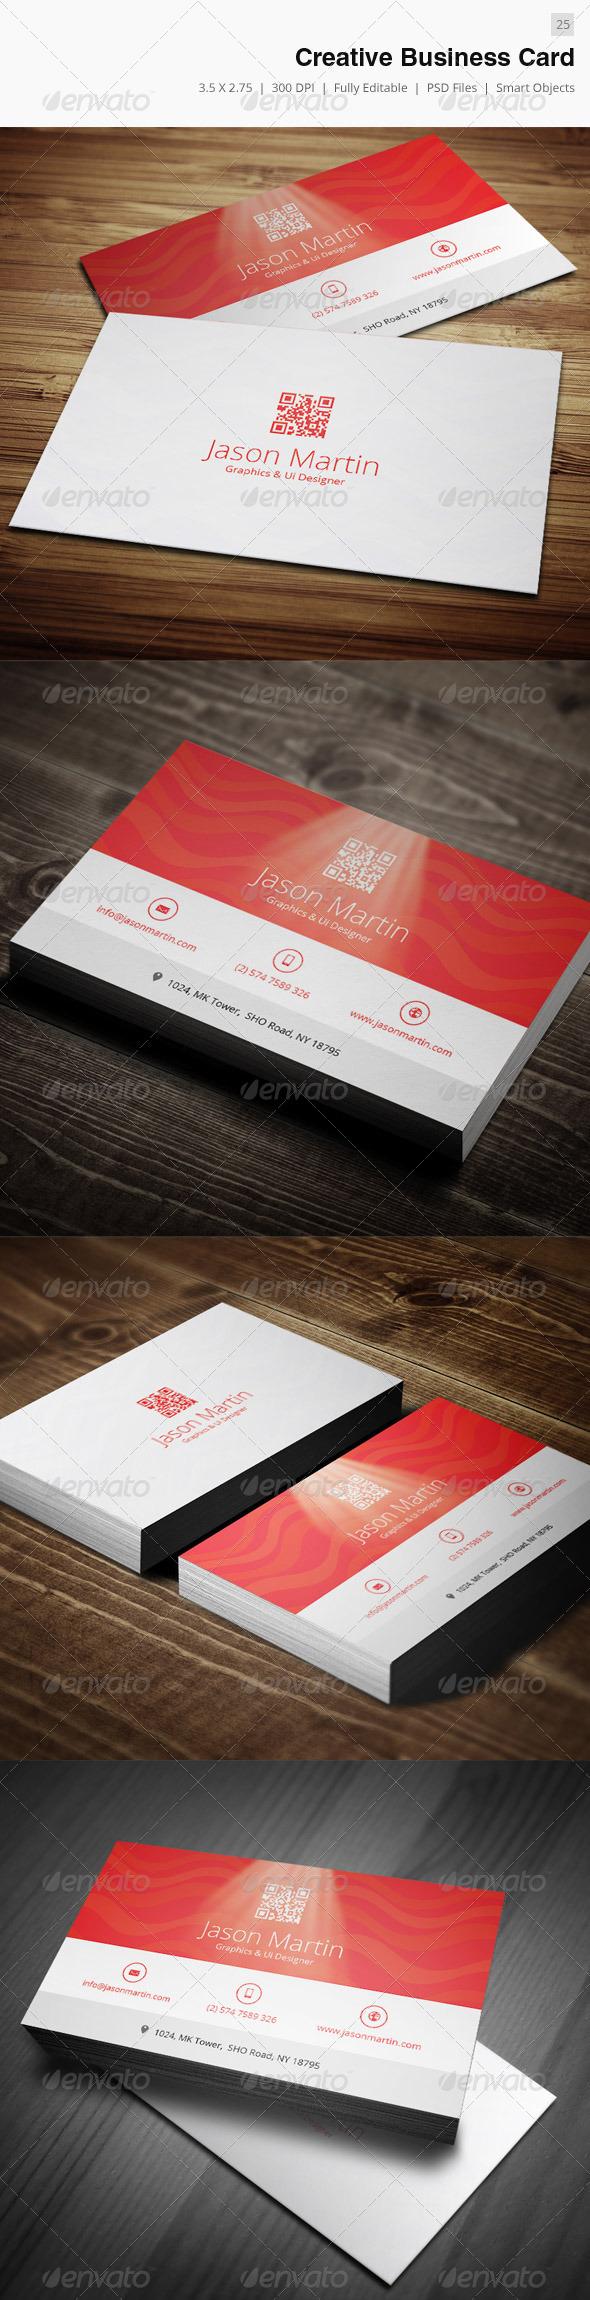 Creative Business Card - 25 - Creative Business Cards